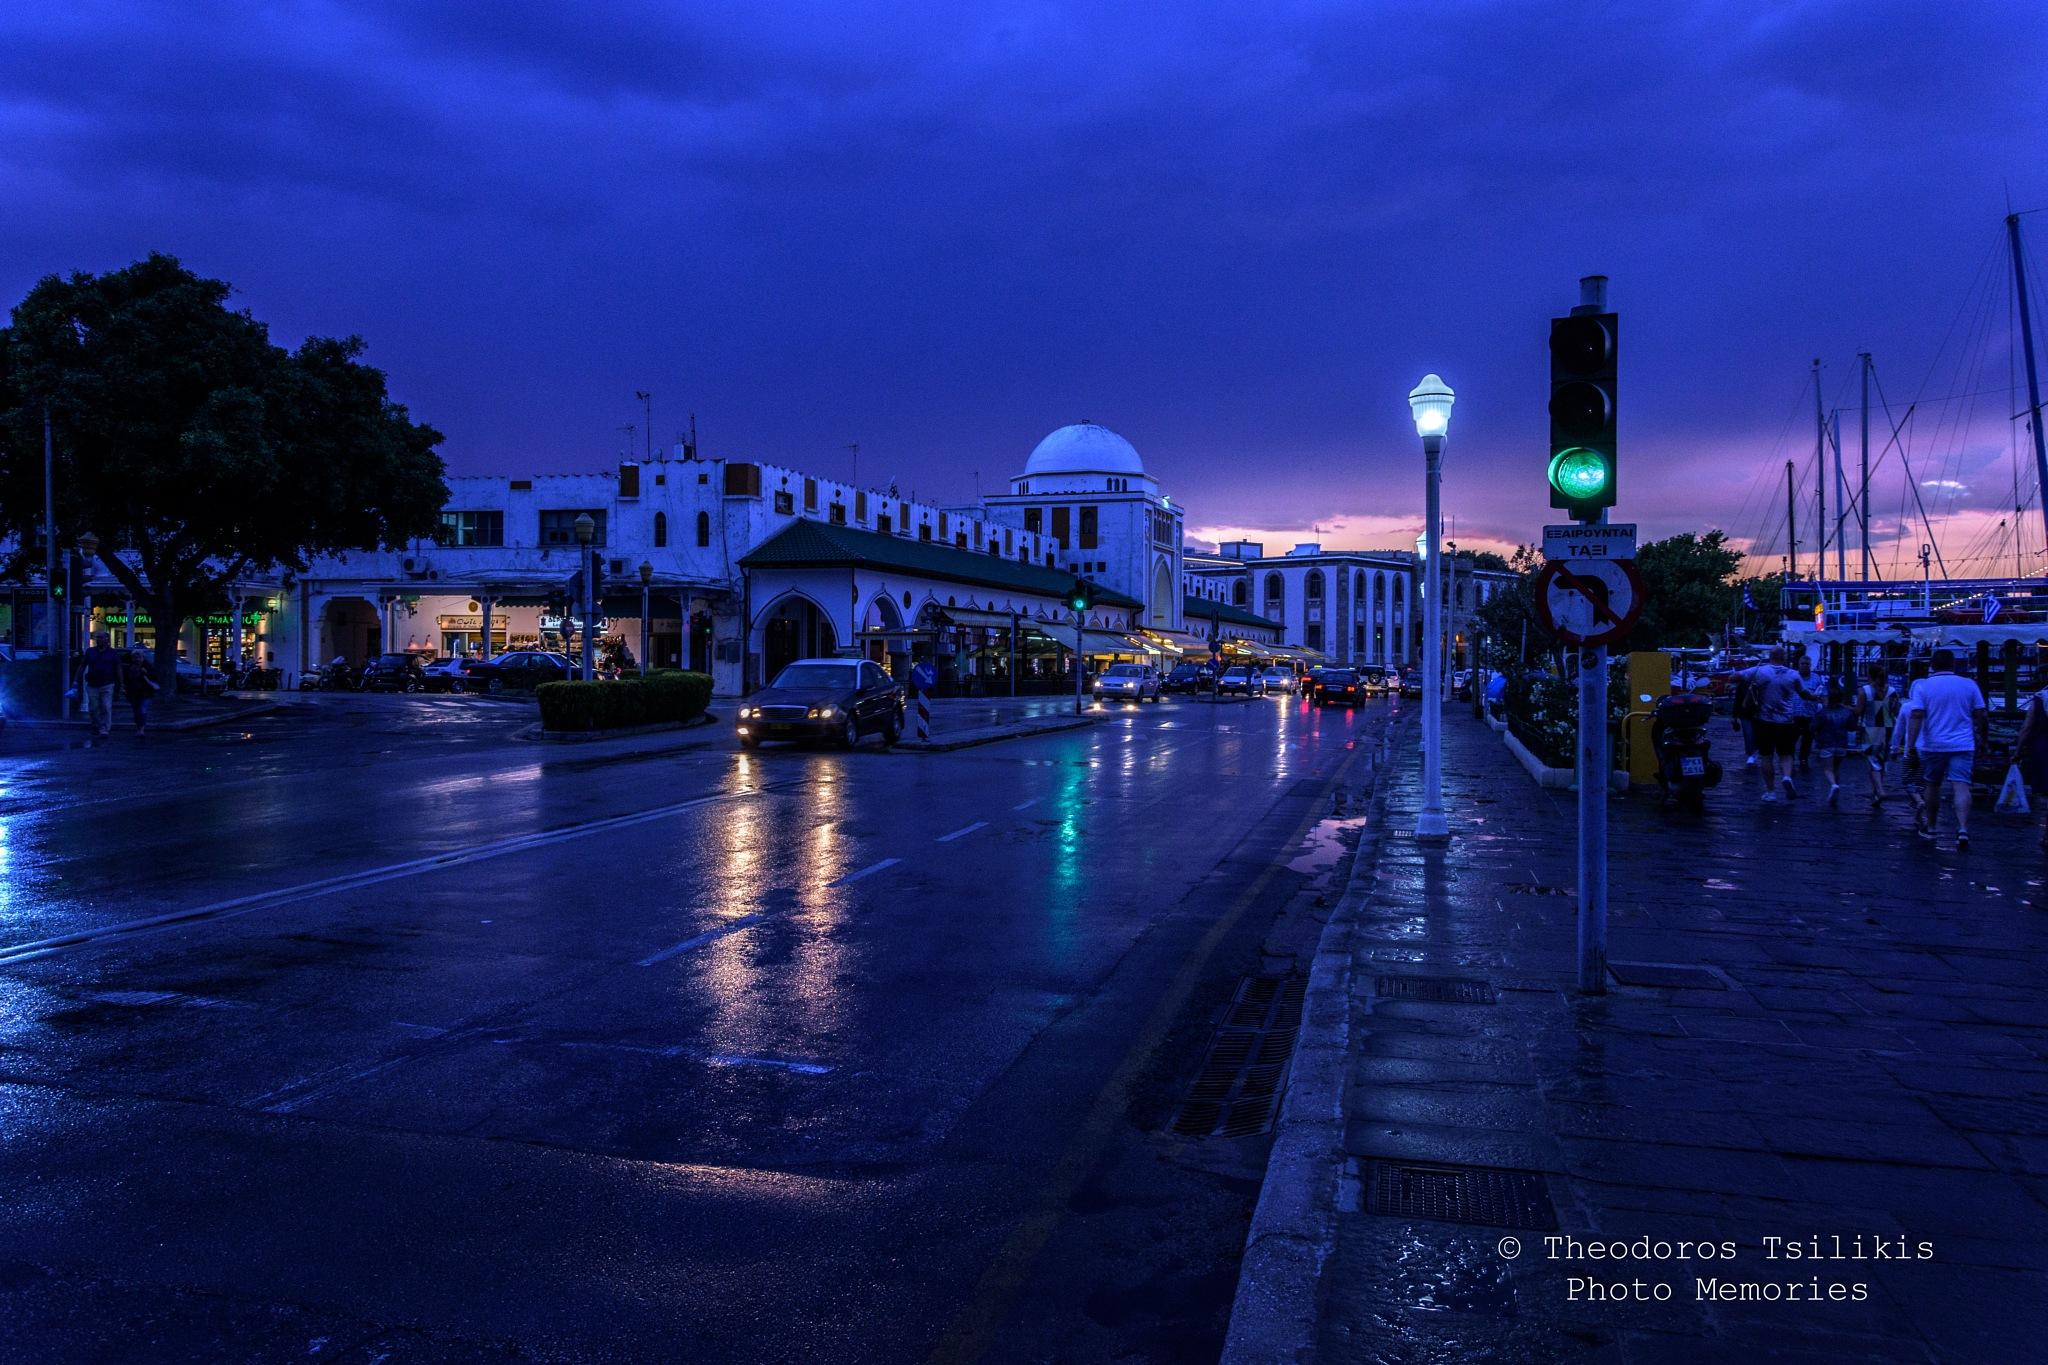 after rain  by Theodoros Tsilikis